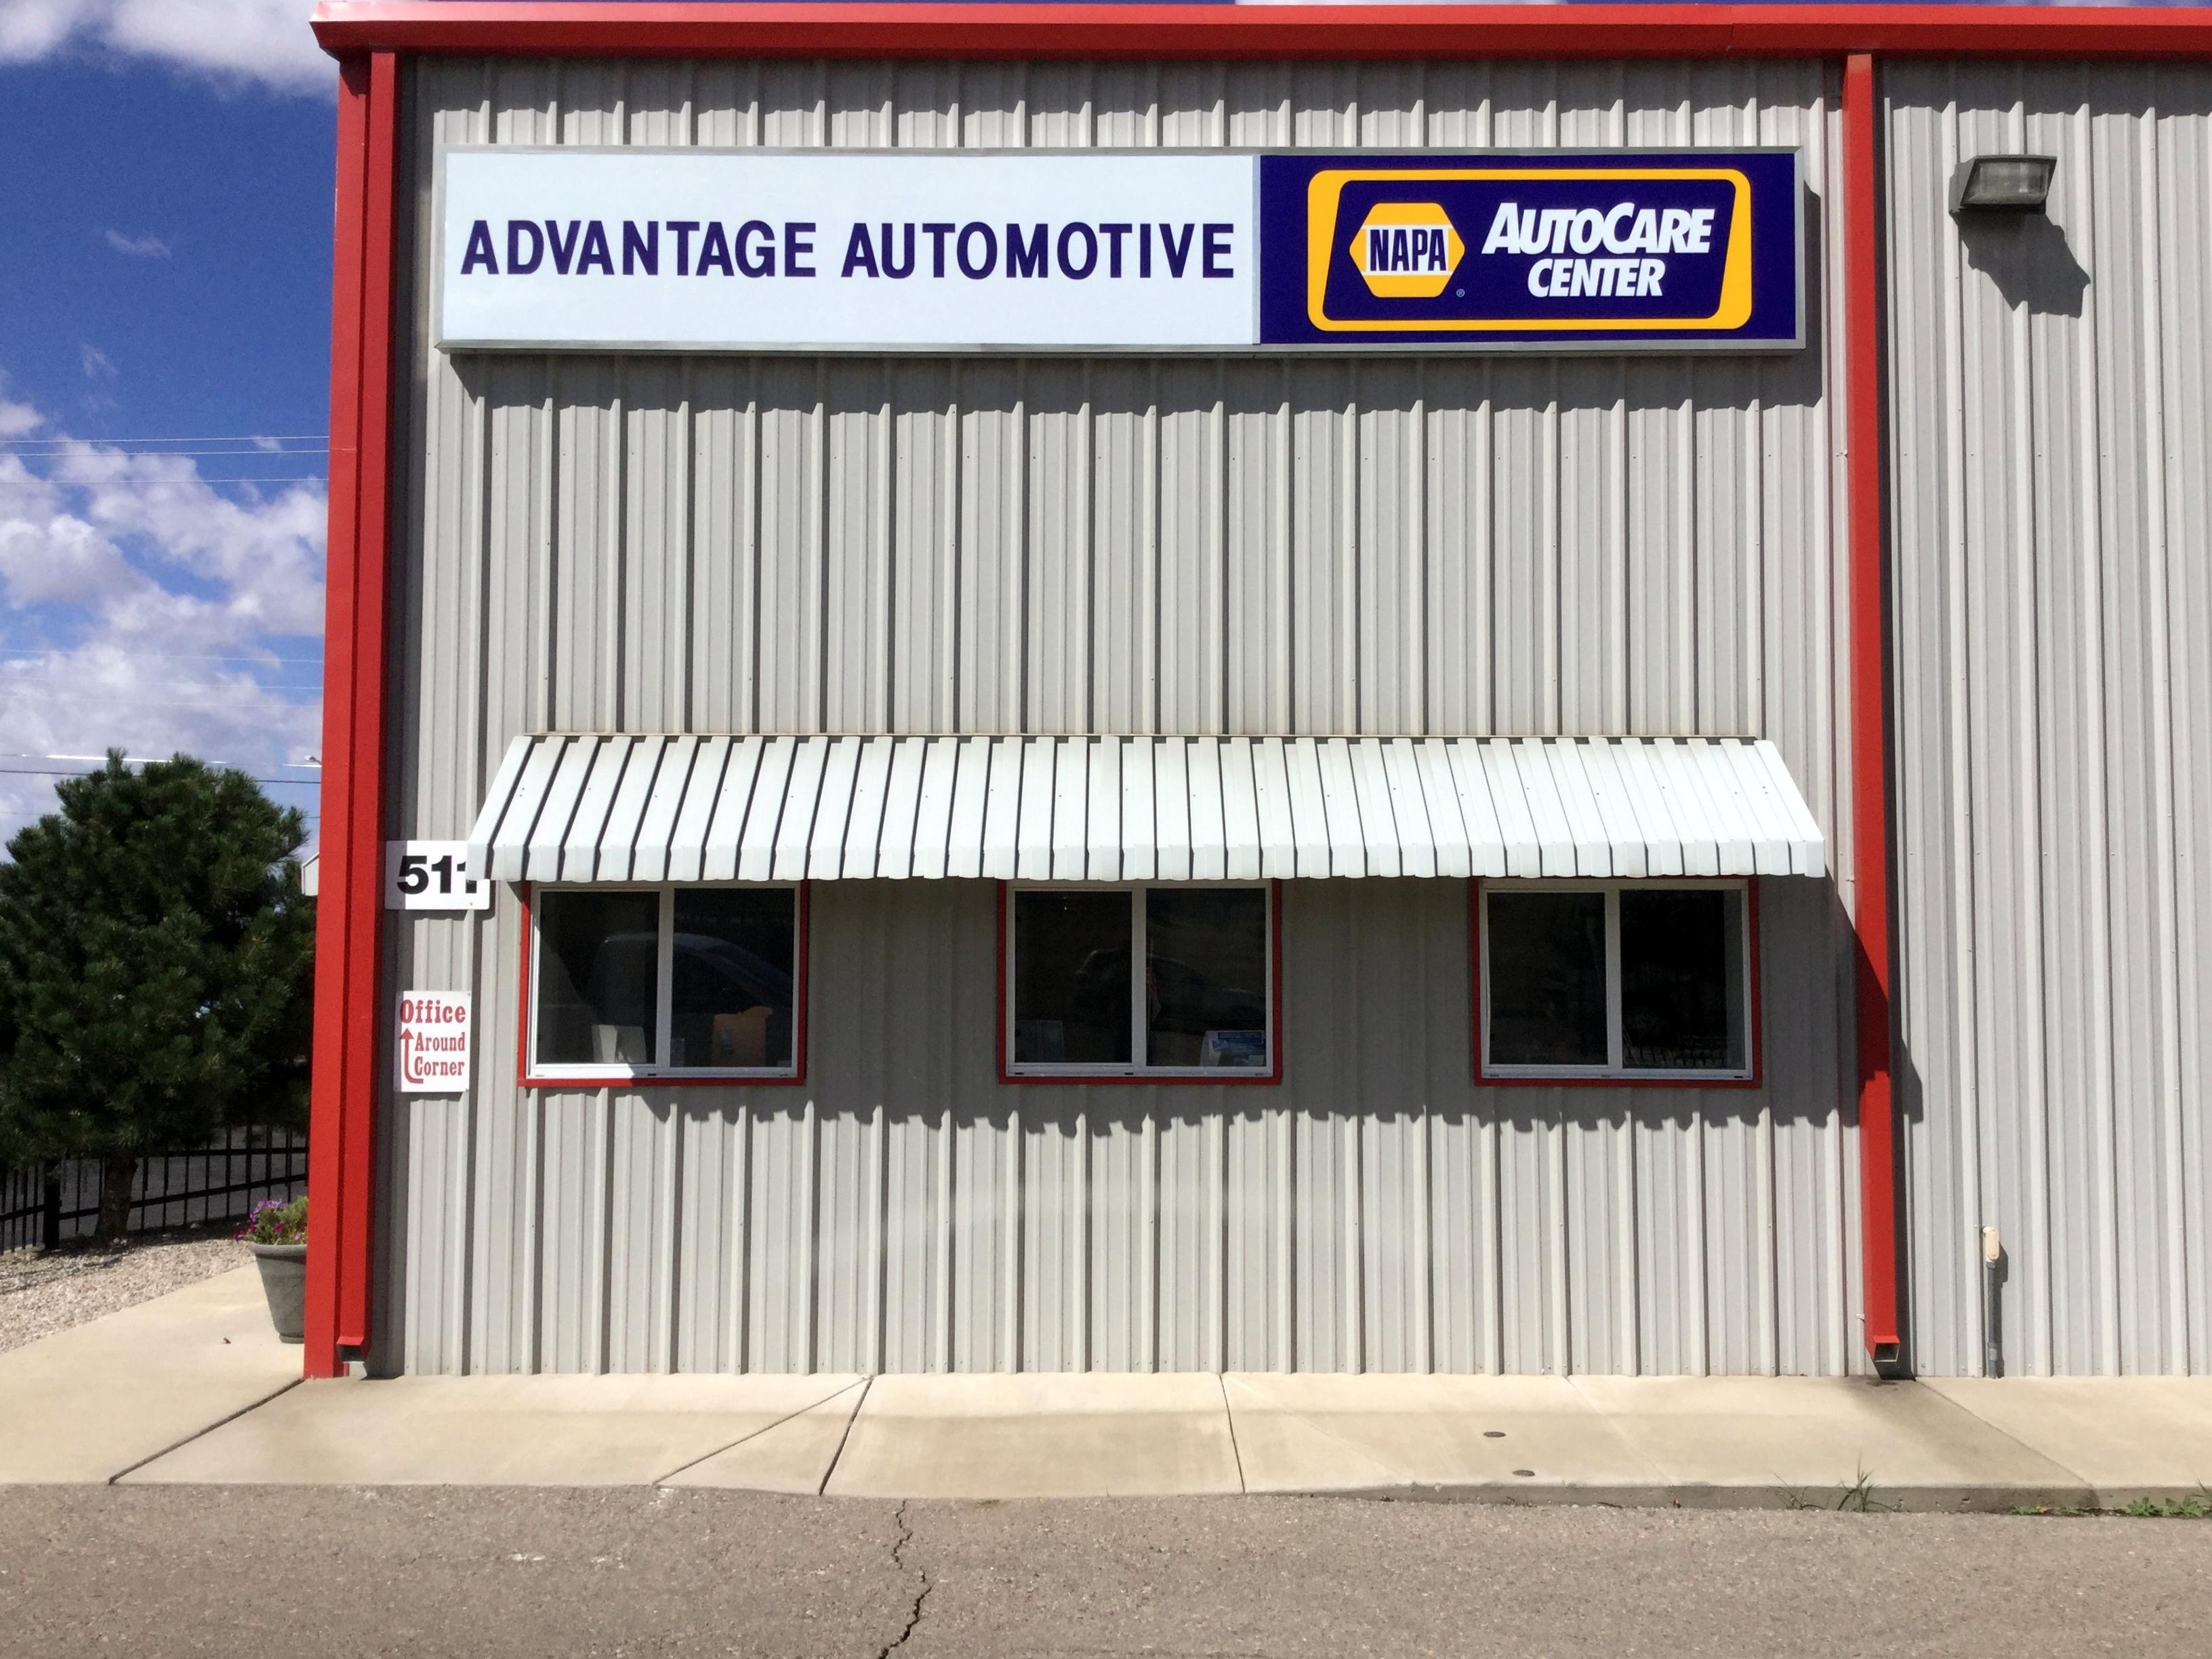 Advantage Automotive image 7